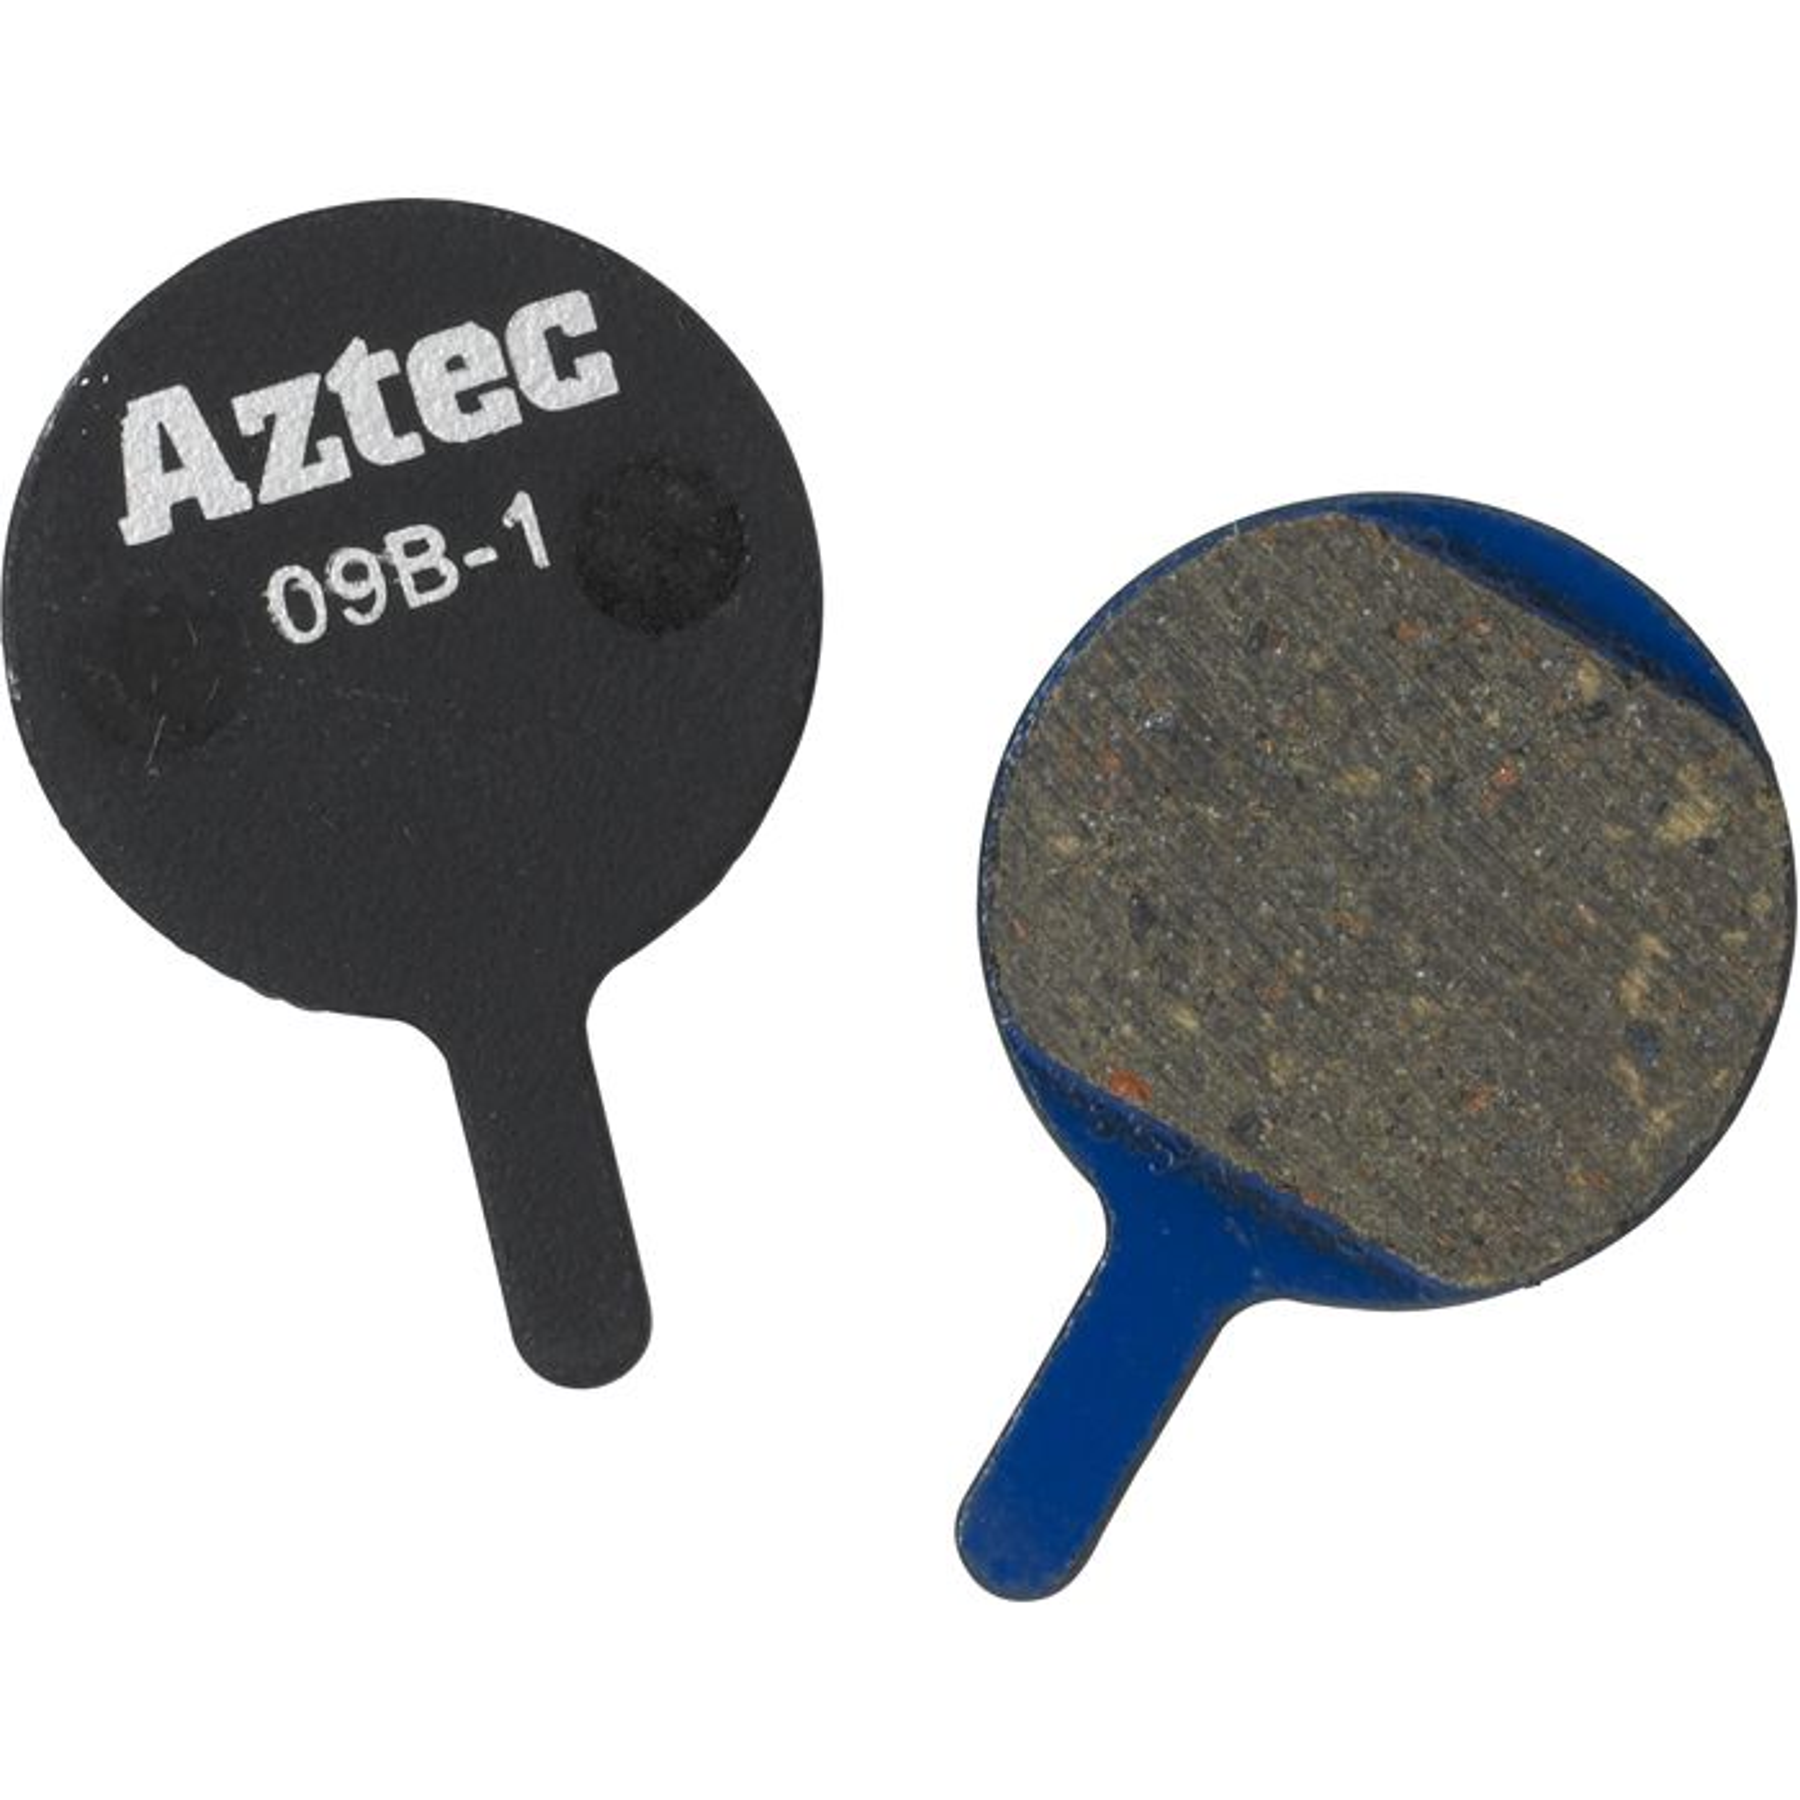 Aztec Organic Disc Brake Pads For Magura Clara 2000 / Louise Callipers | Brake pads